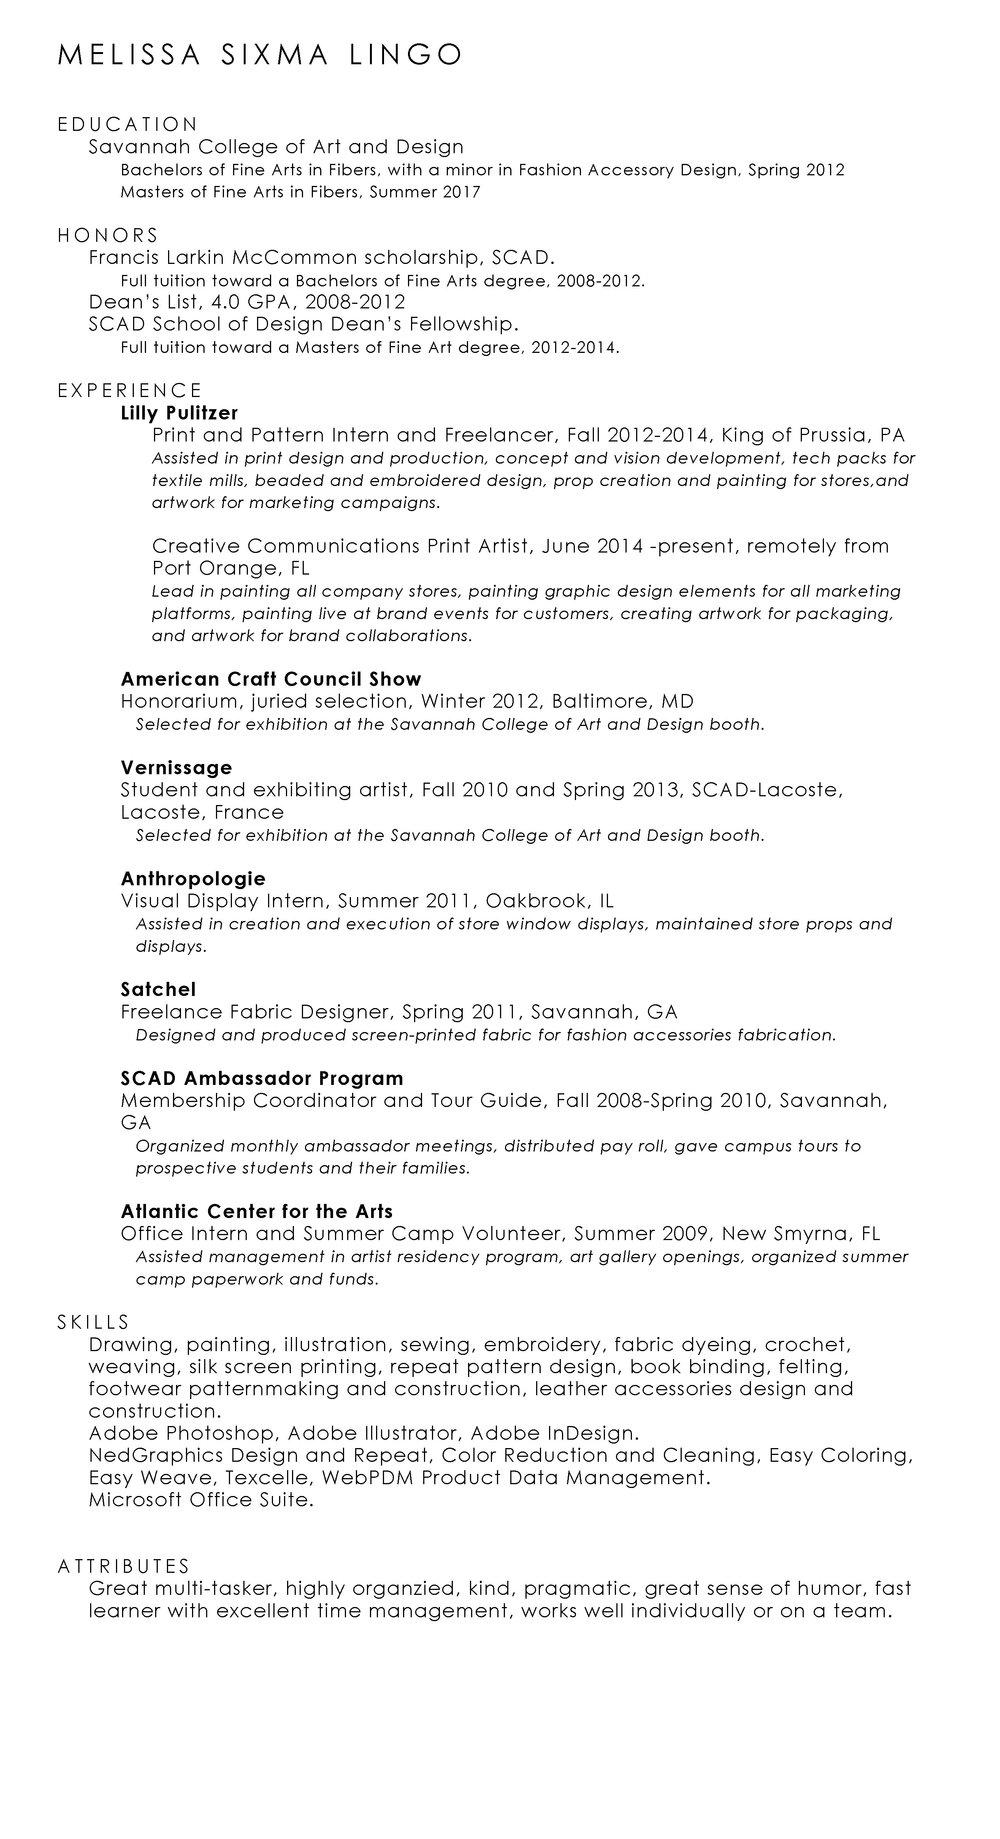 Resume 2018.jpg